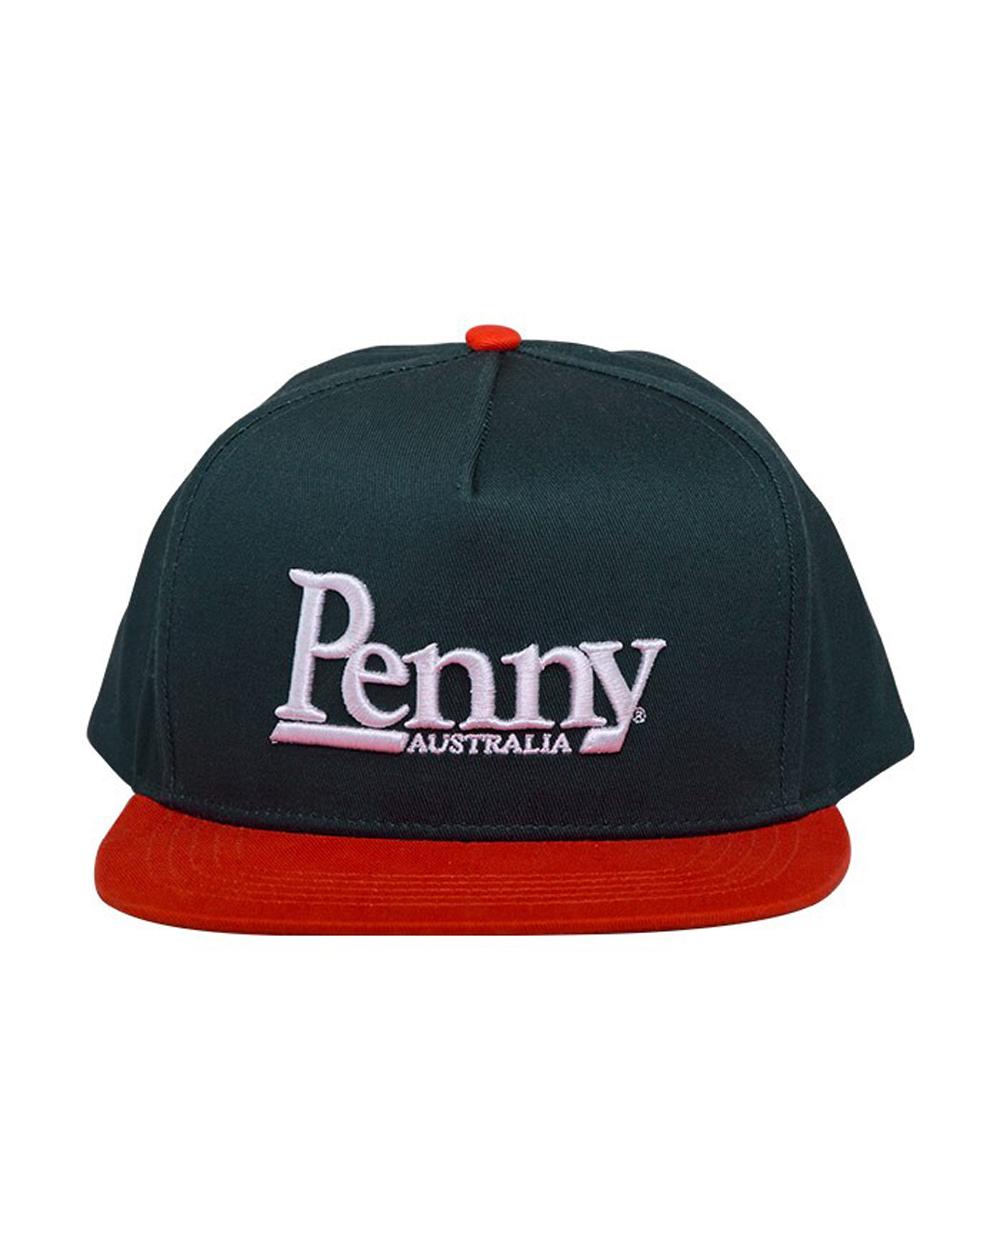 Penny Logo Casquette de Baseball Snapback Homme Dark Green/Orange